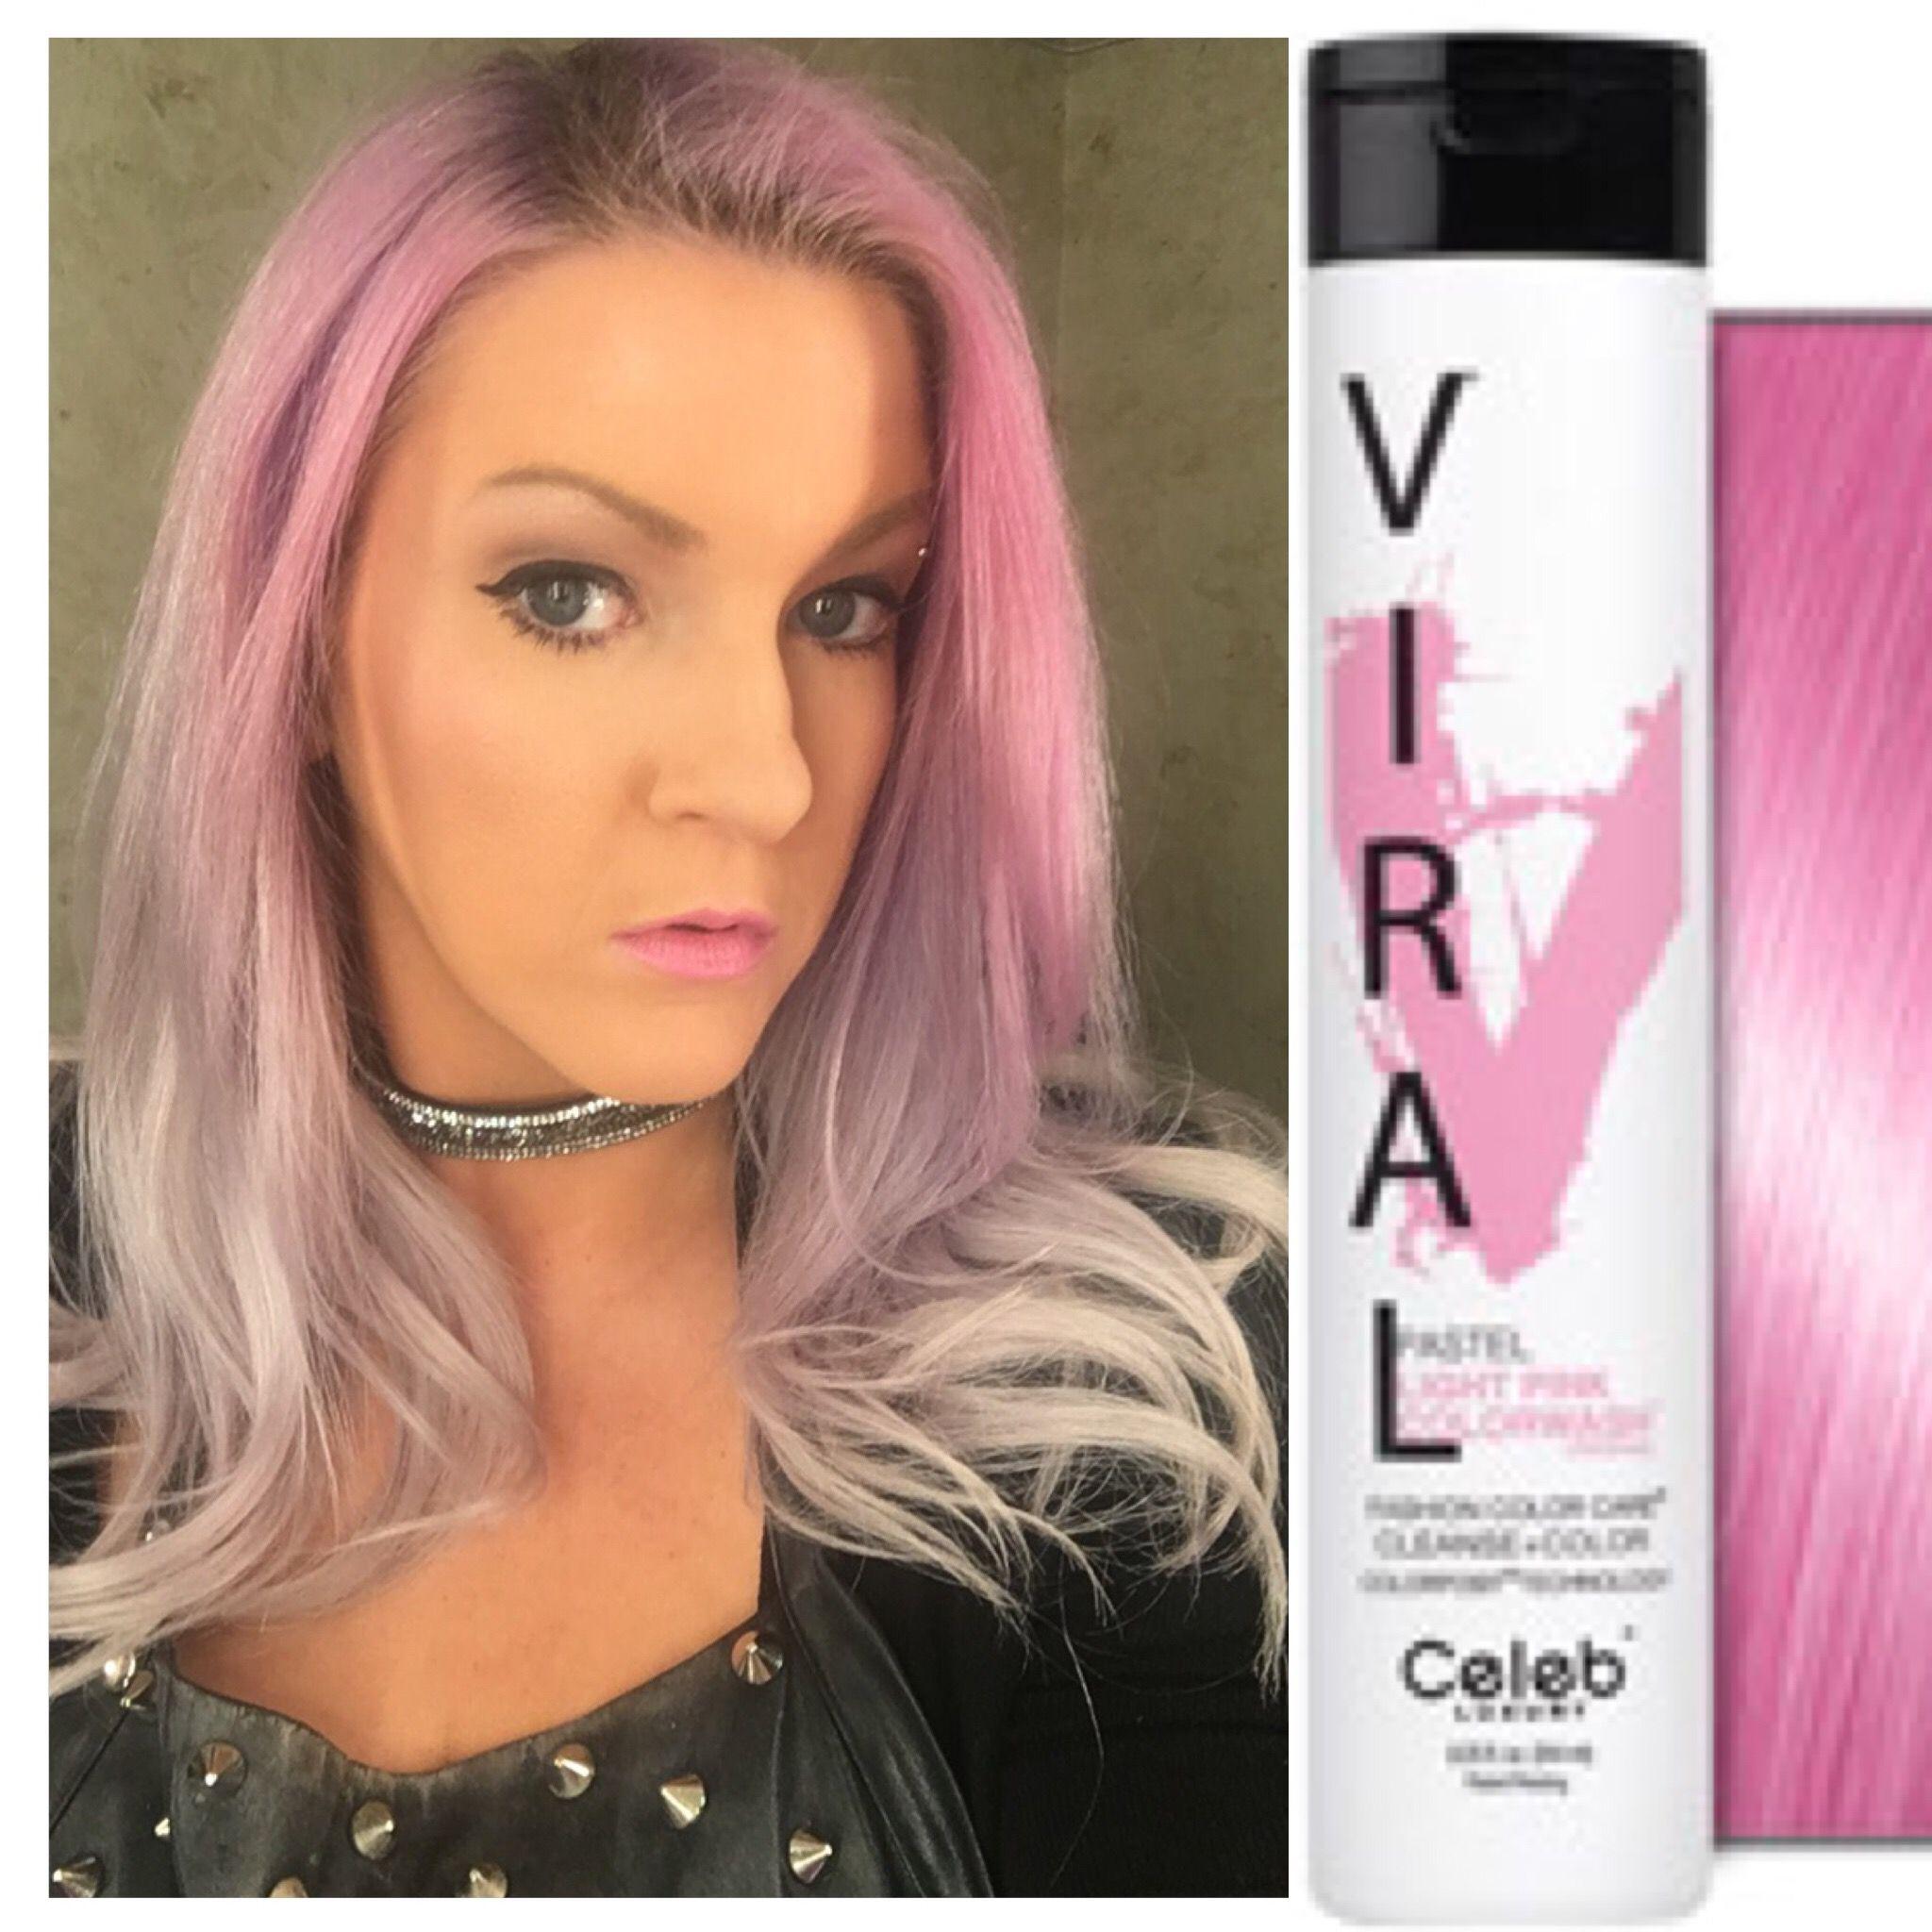 Superb Color Wash For Hair Part - 8: Used Celeb Lux Viral Color Wash!